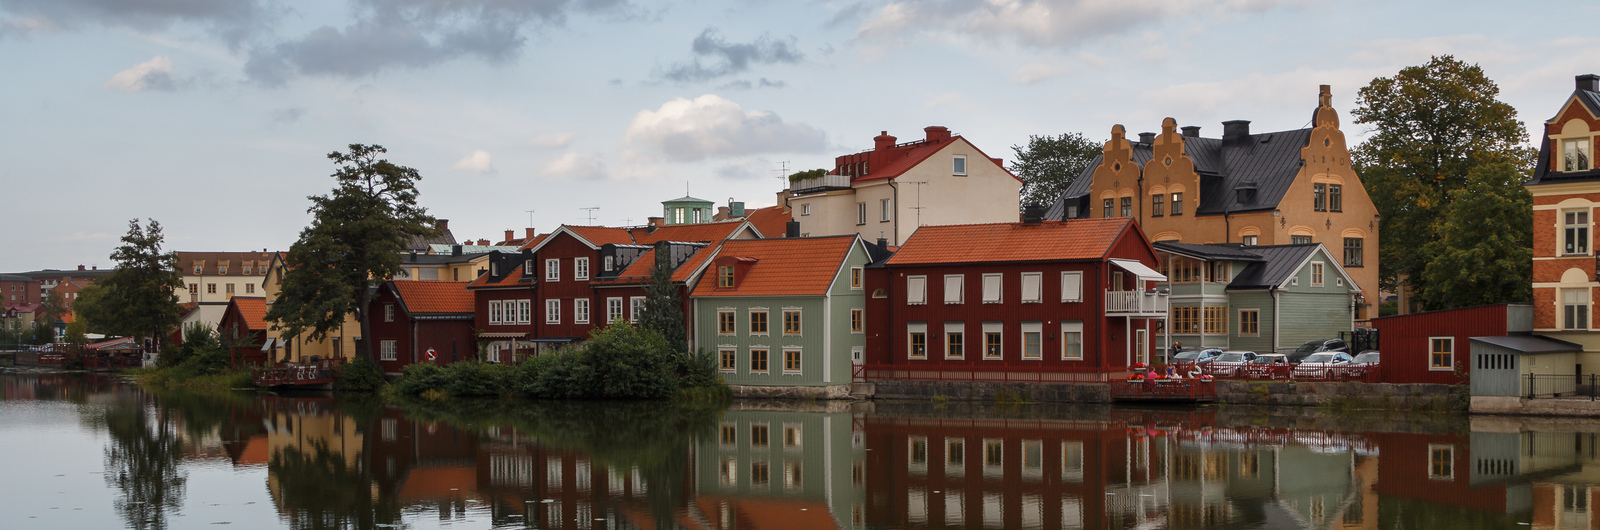 eskilstuna city header